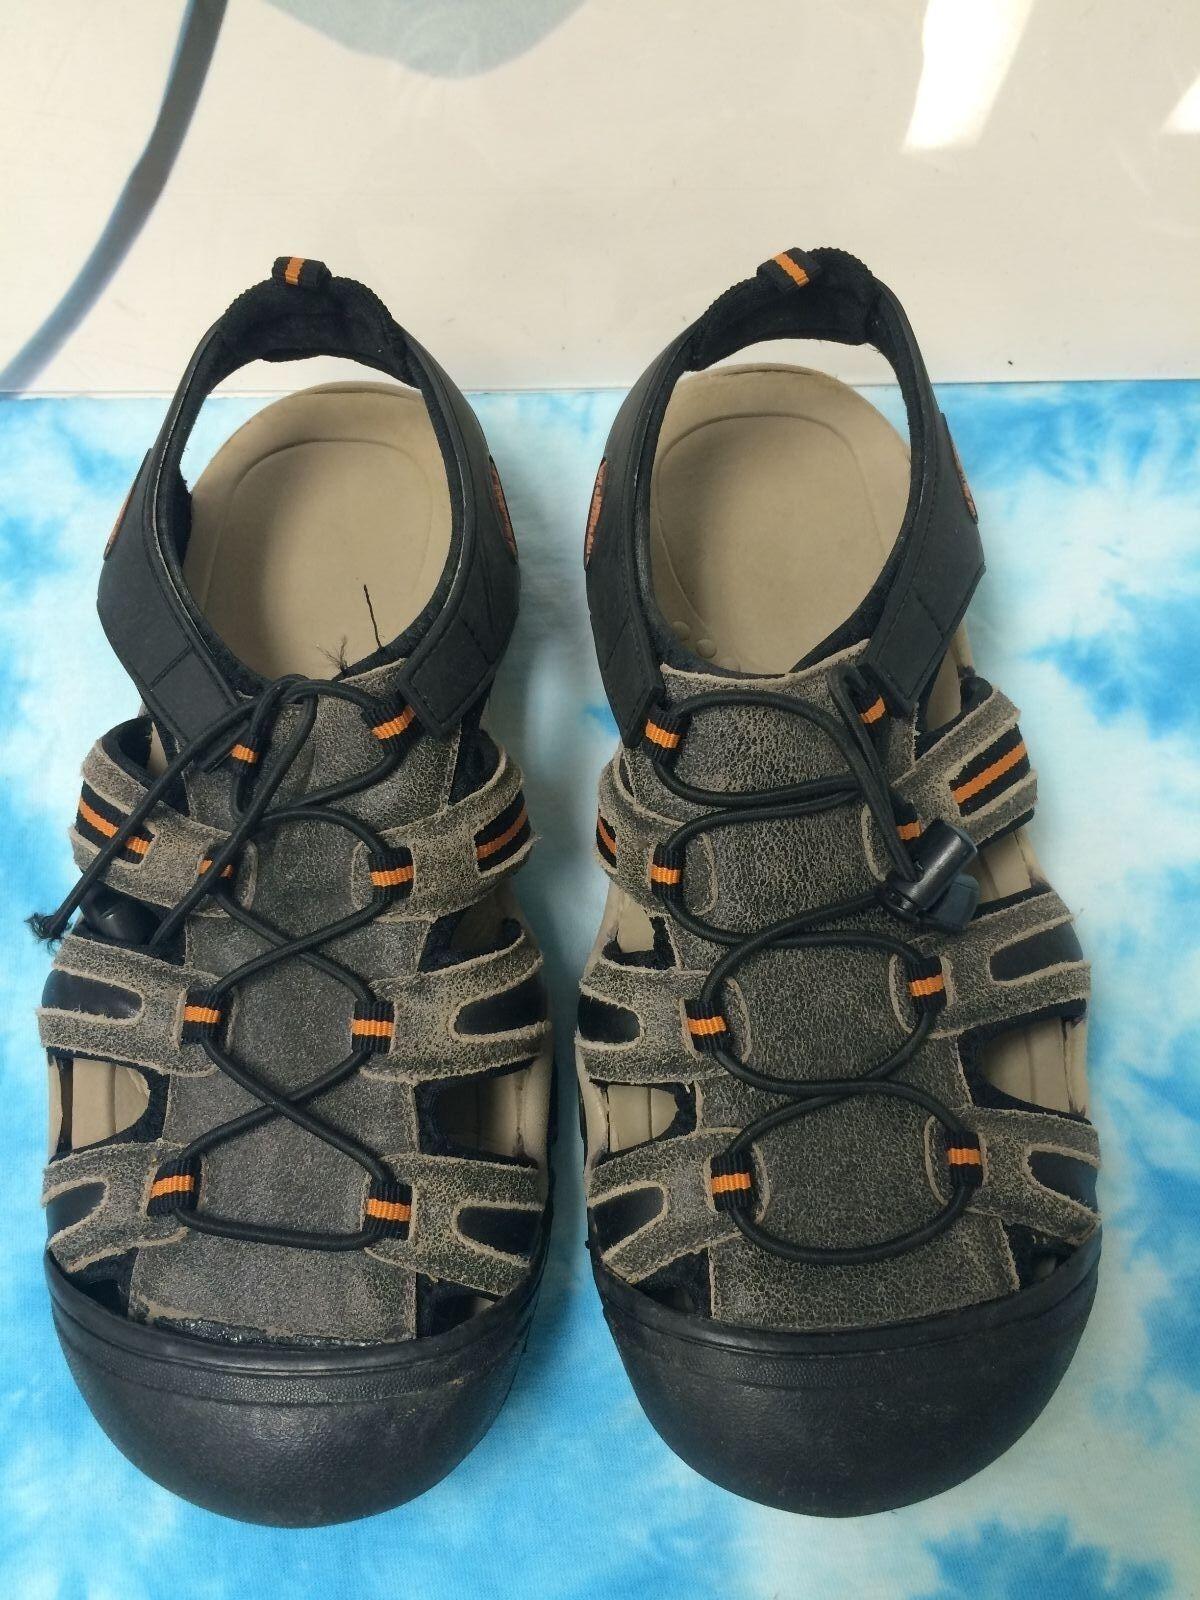 TAMARACK Mens Mens Mens Leather SANDALS Size 8 21cc9d